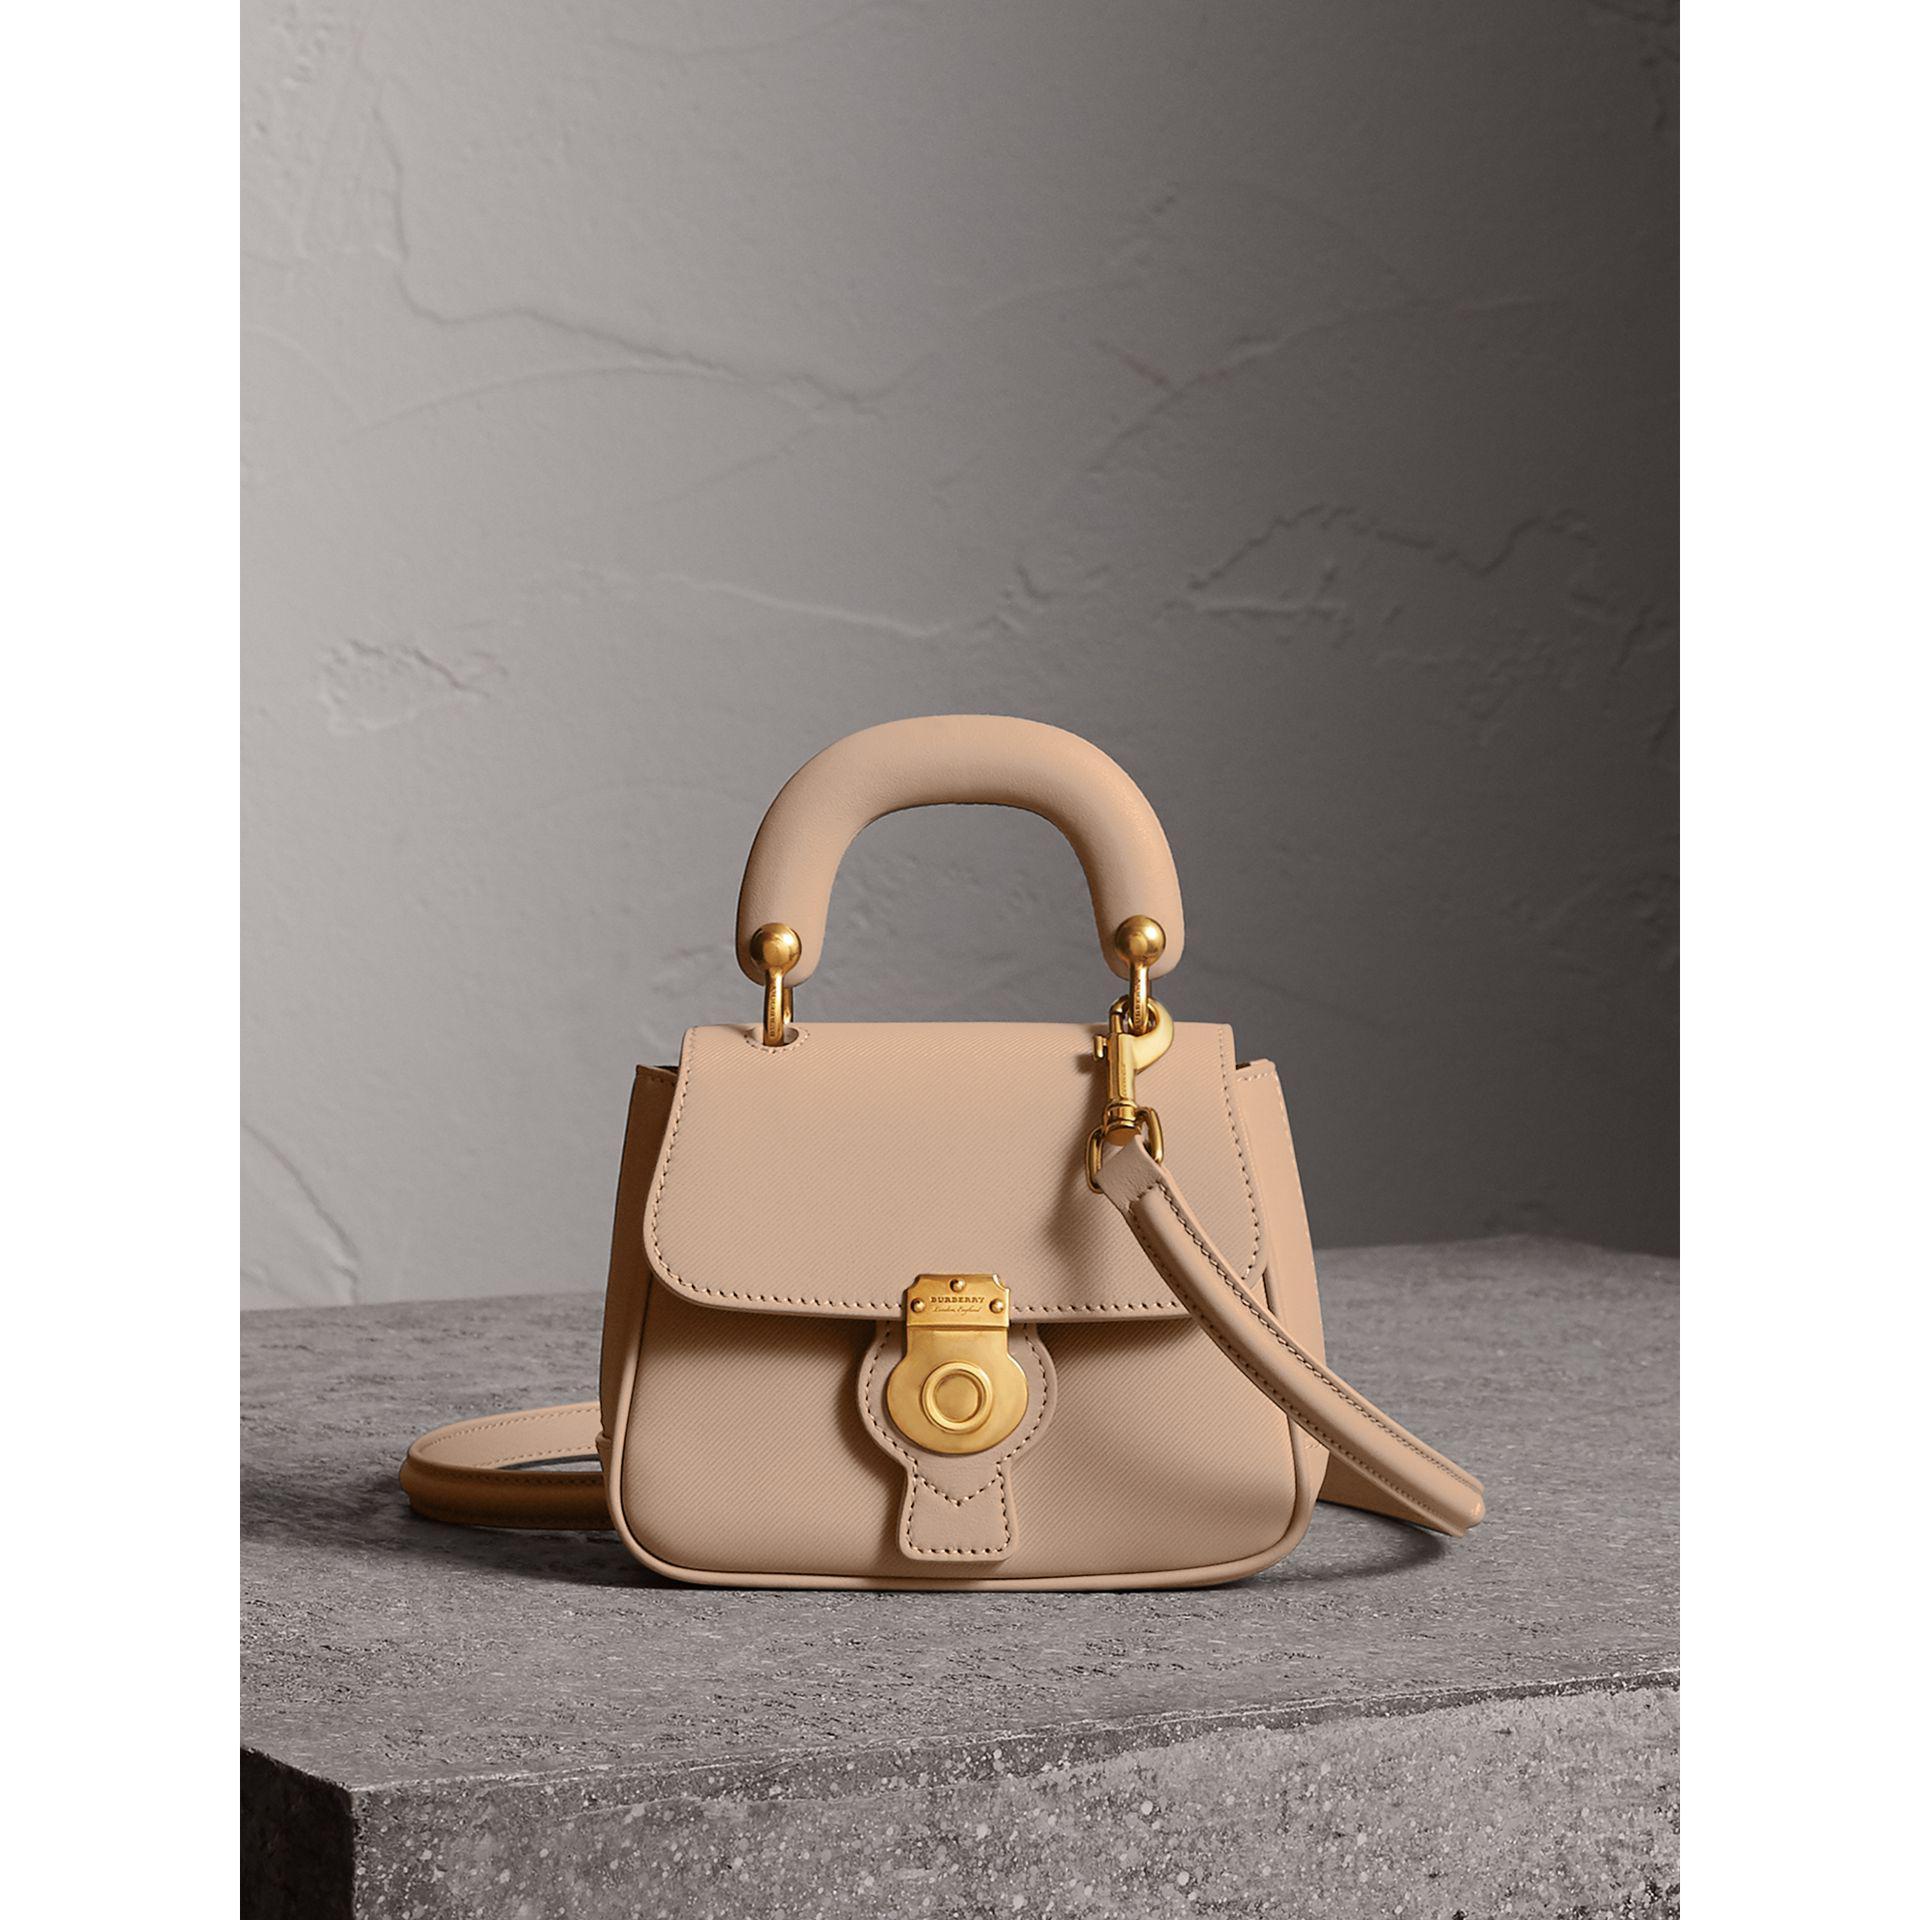 Lyst - Burberry The Mini Dk88 Top Handle Bag In Honey  c9a9e08c2cfc8